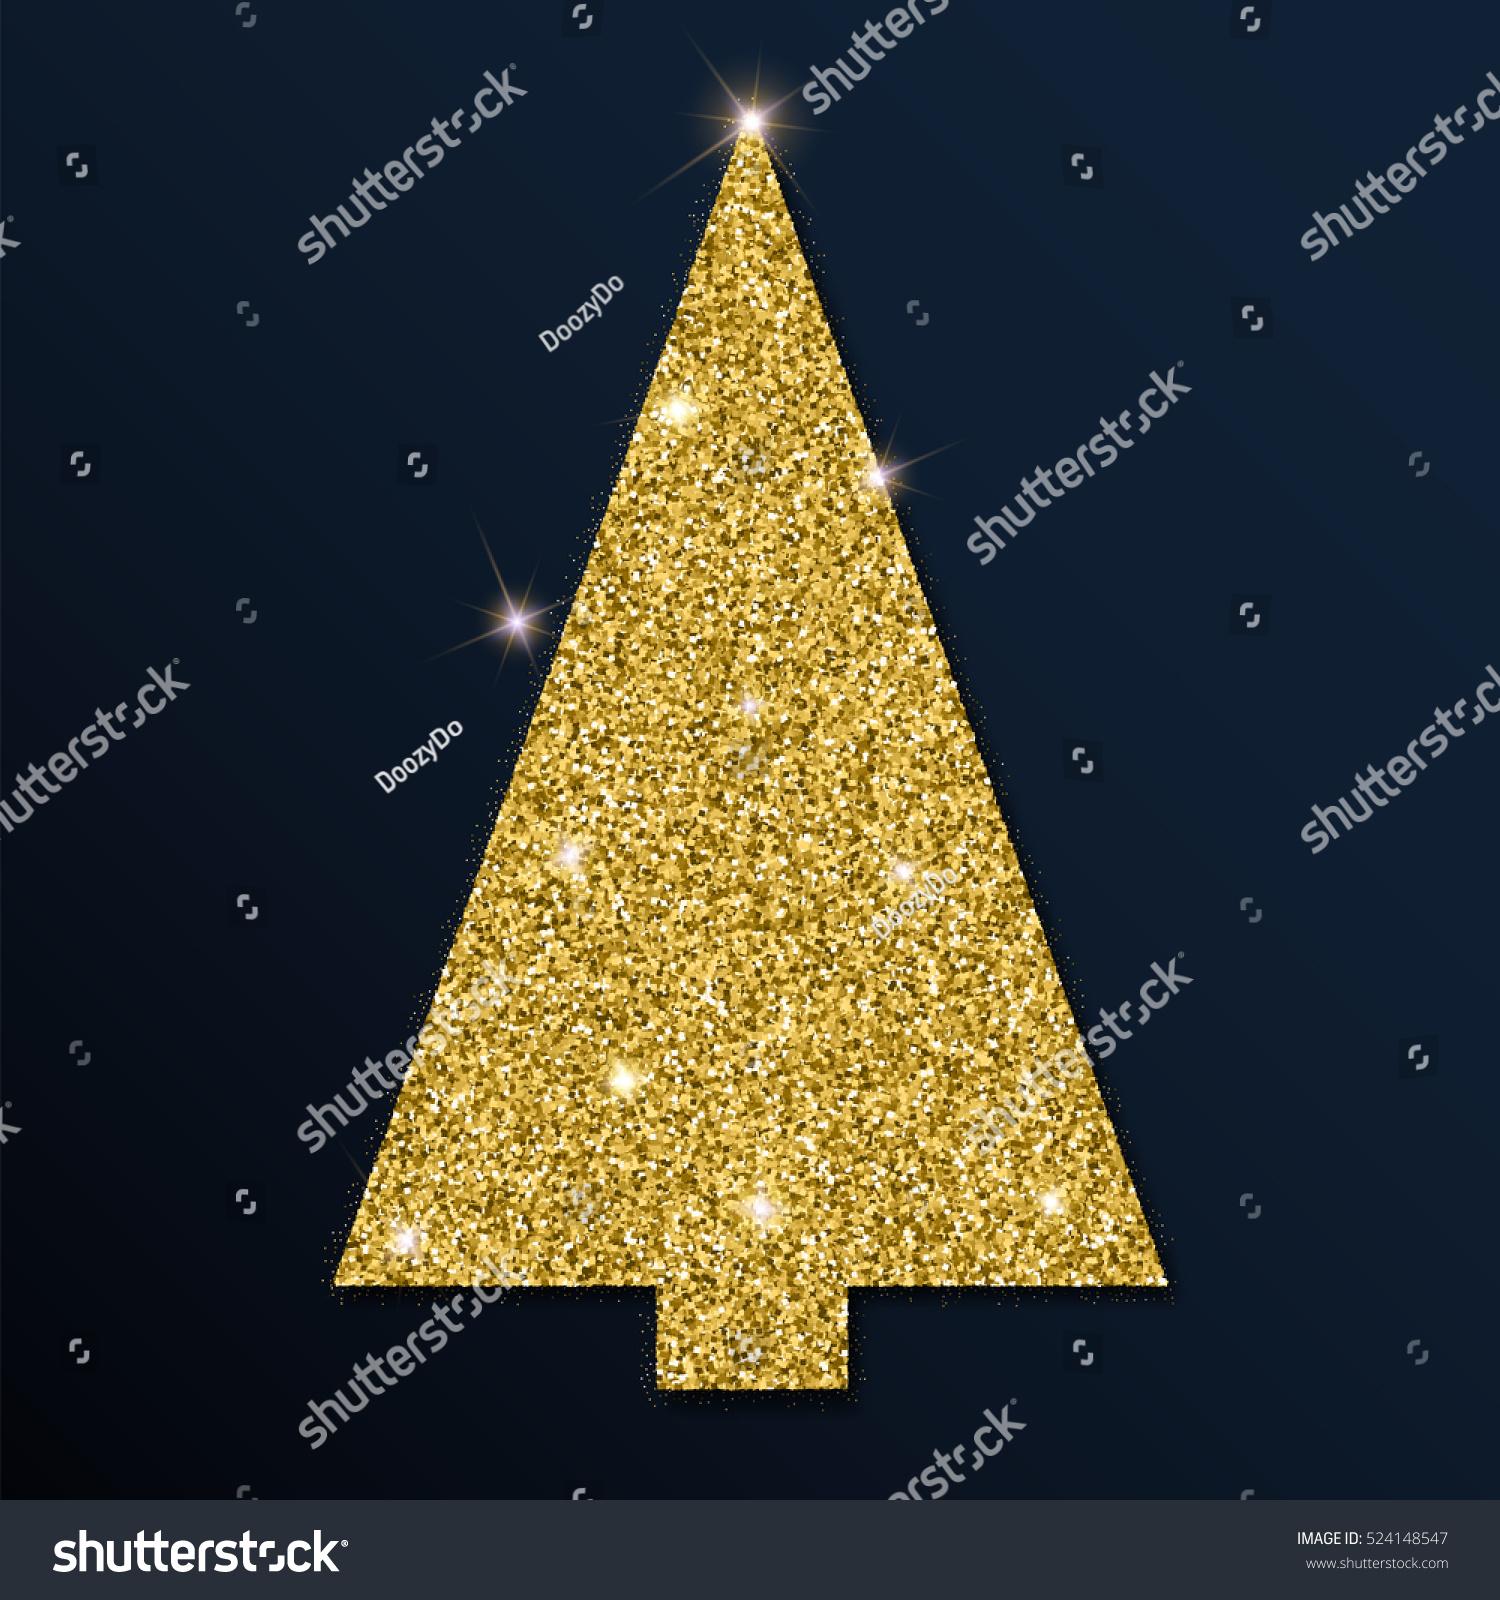 golden glitter unique christmas tree luxurious christmas design element with golden glitter christmas tree - Unique Christmas Trees